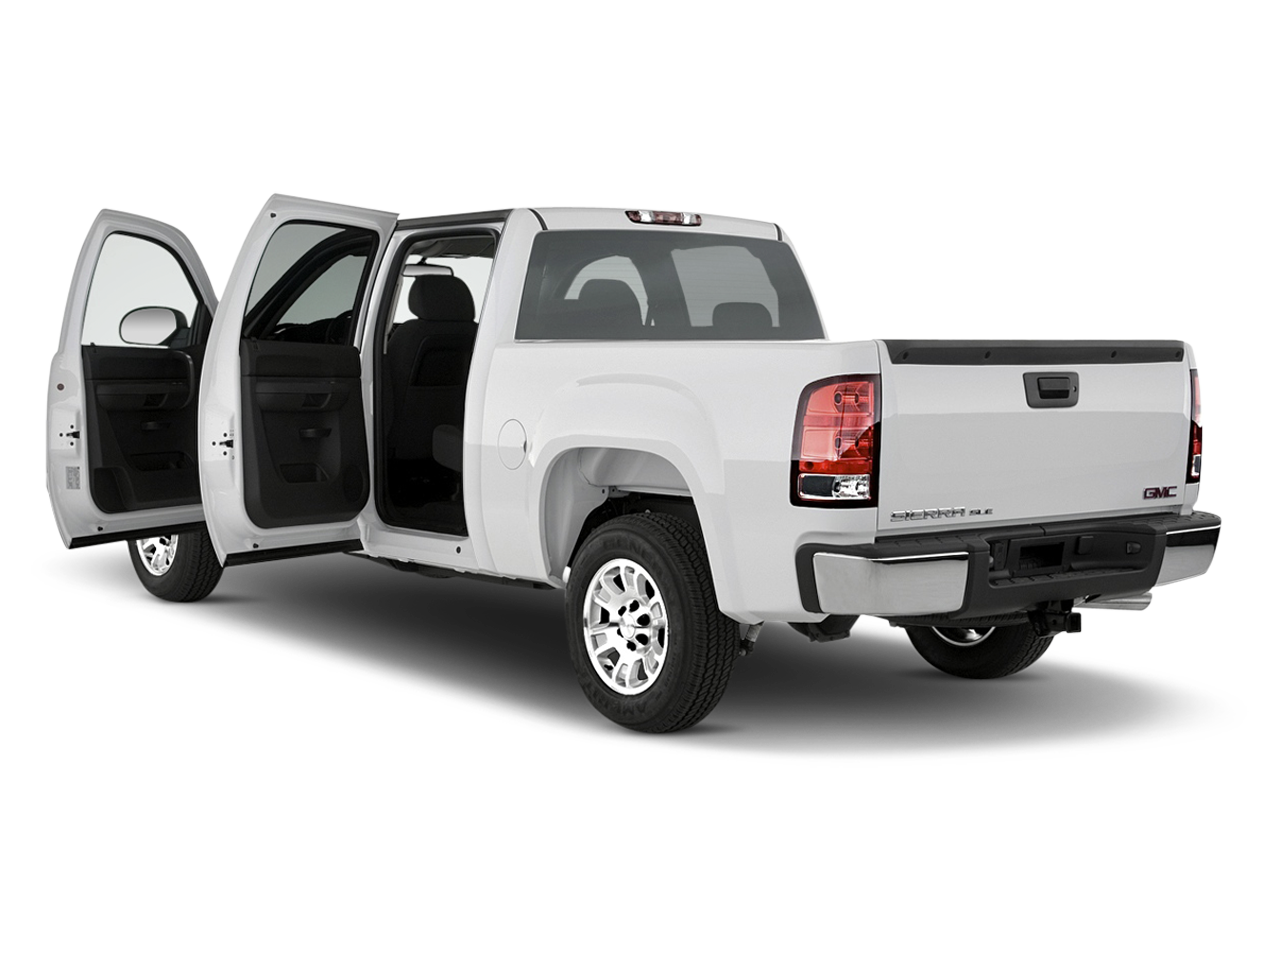 2011 gmc sierra 3500 hd crew cab slt 4x4 automobile magazine. Black Bedroom Furniture Sets. Home Design Ideas